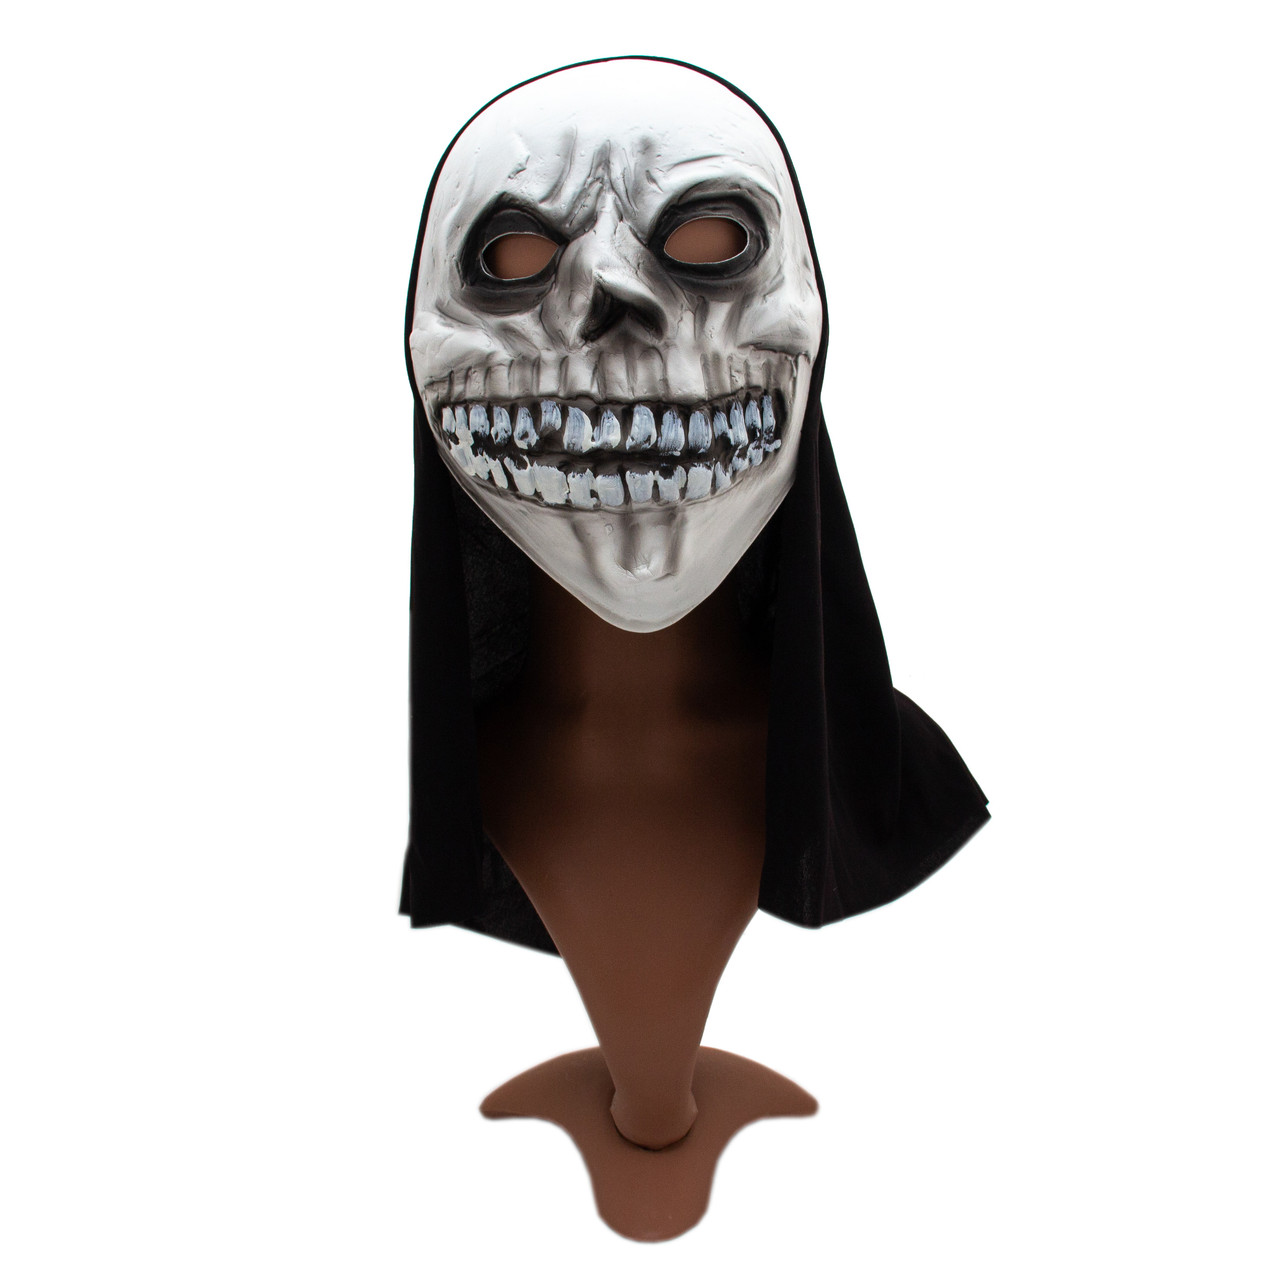 Карнавальна маска Череп, 20*38 см, поліестер, білий (462544)